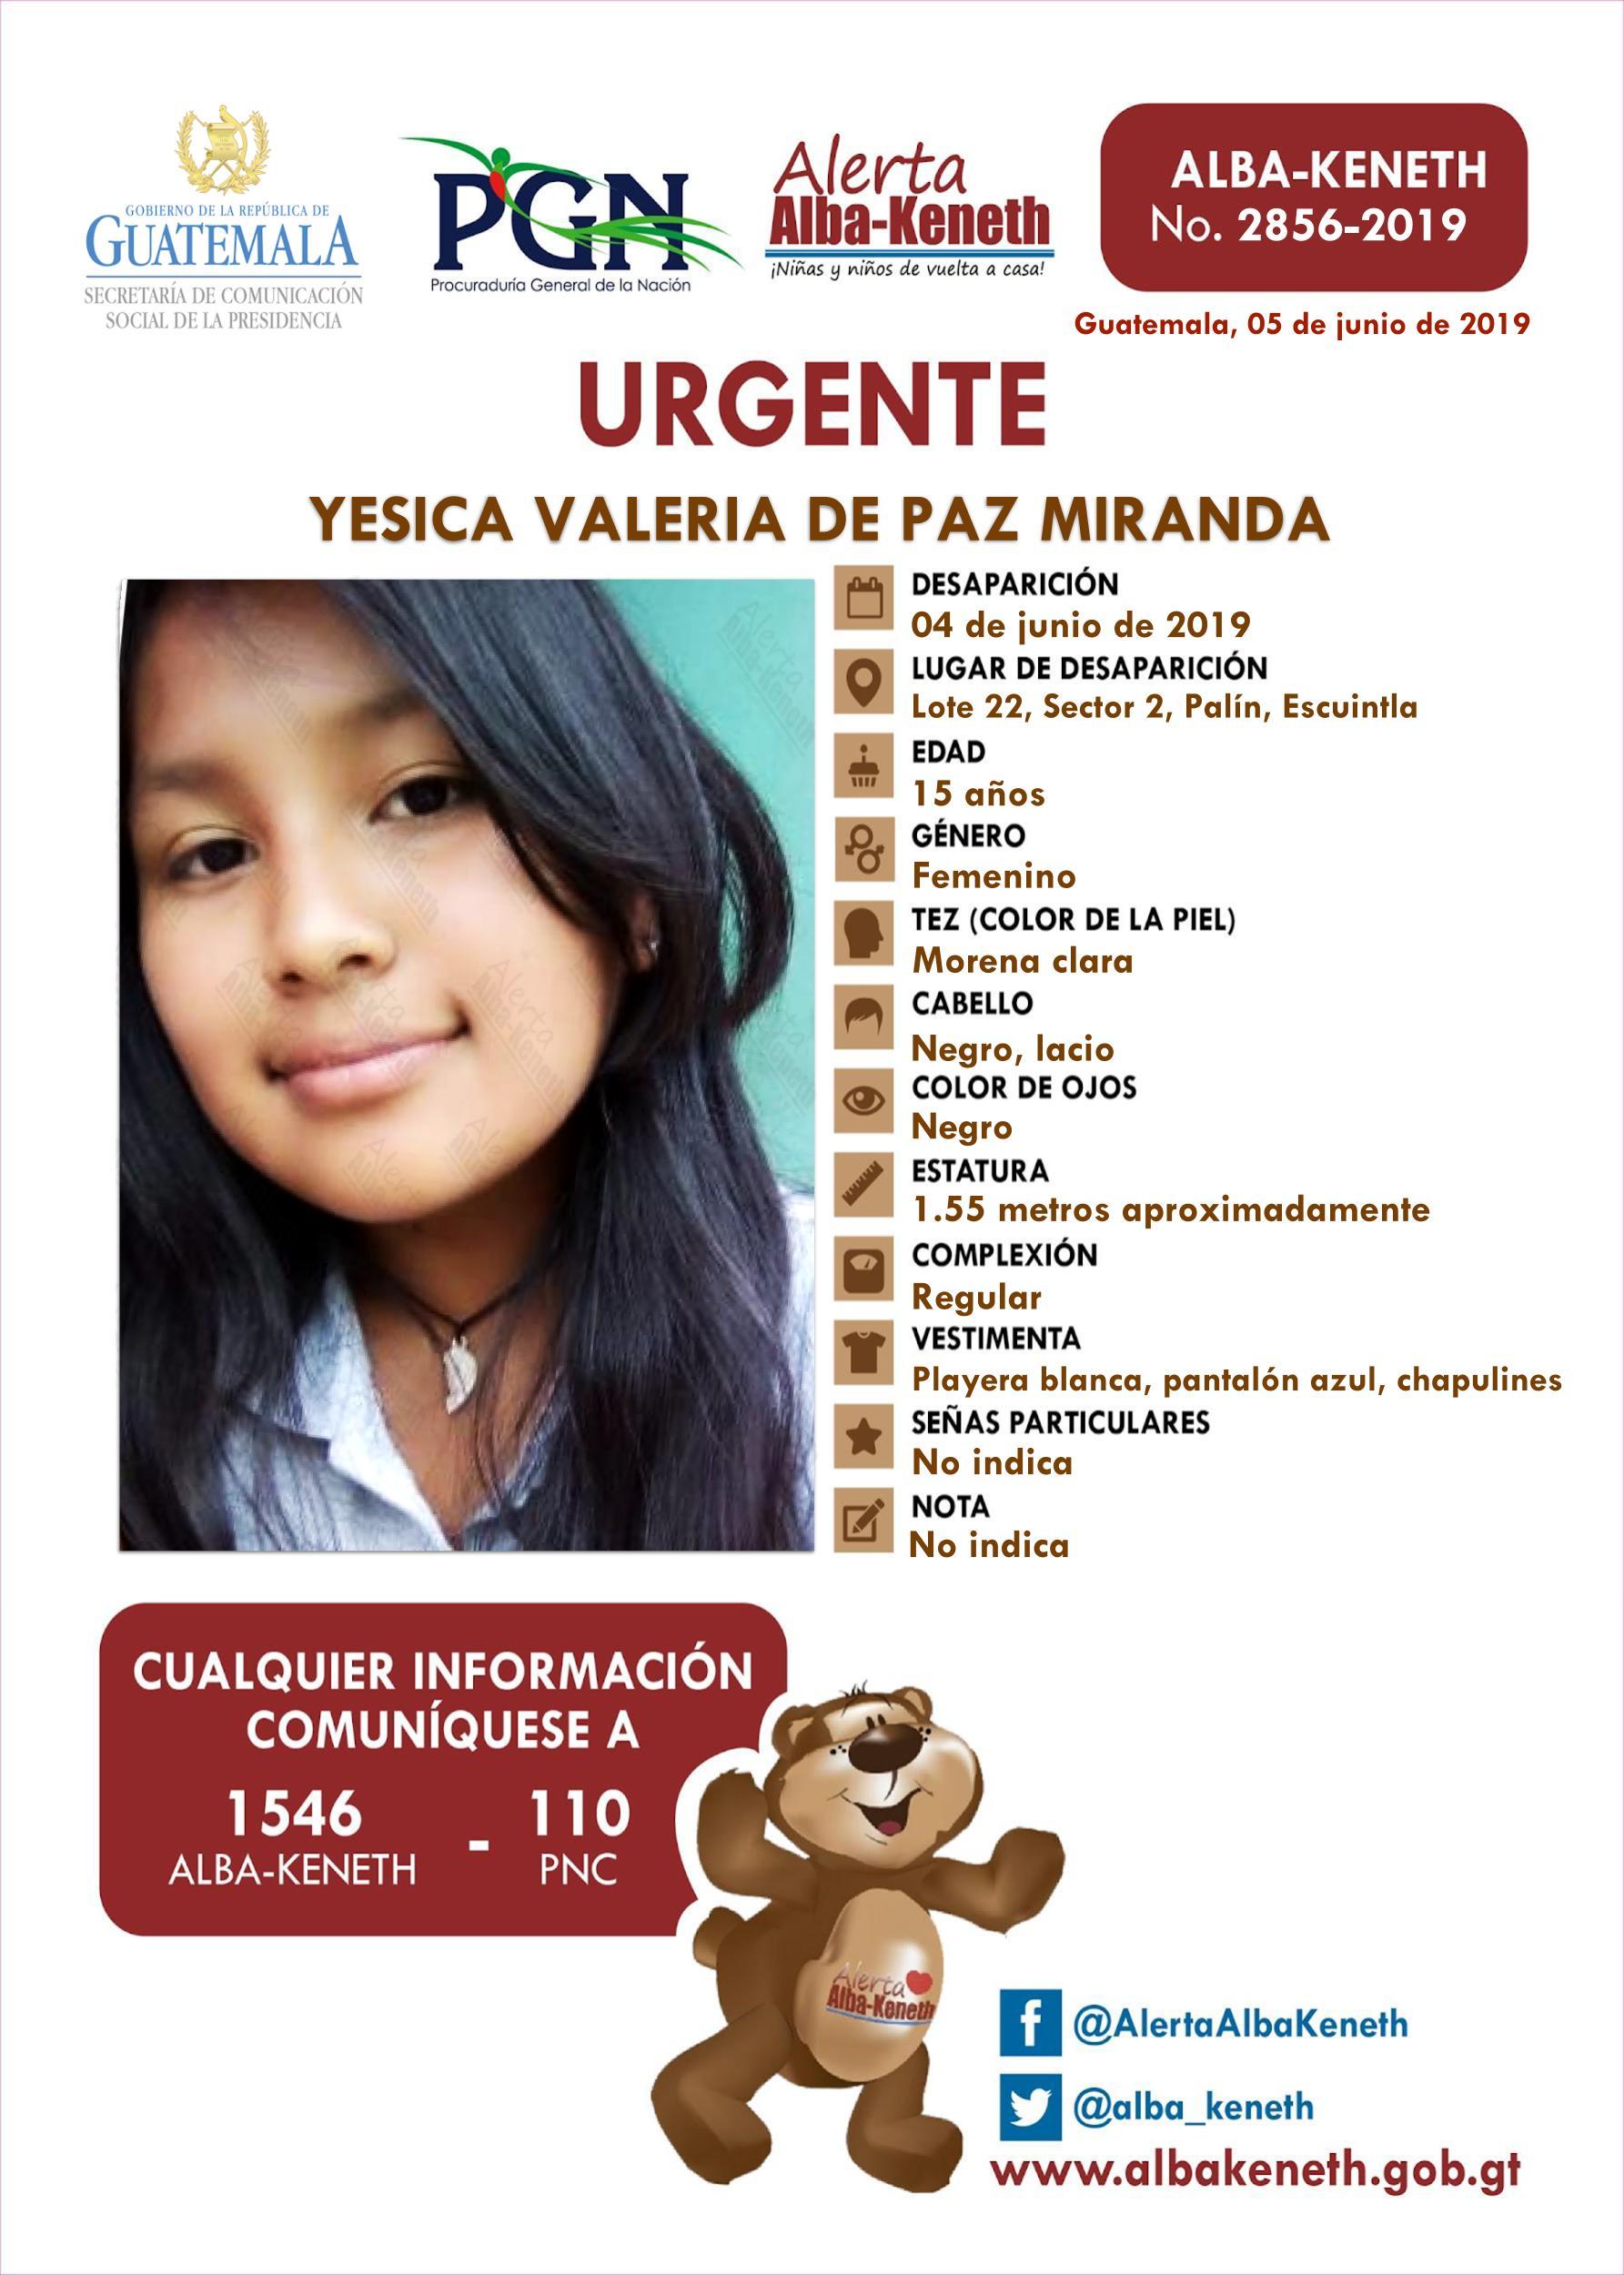 Yesica Valeria de Paz Miranda